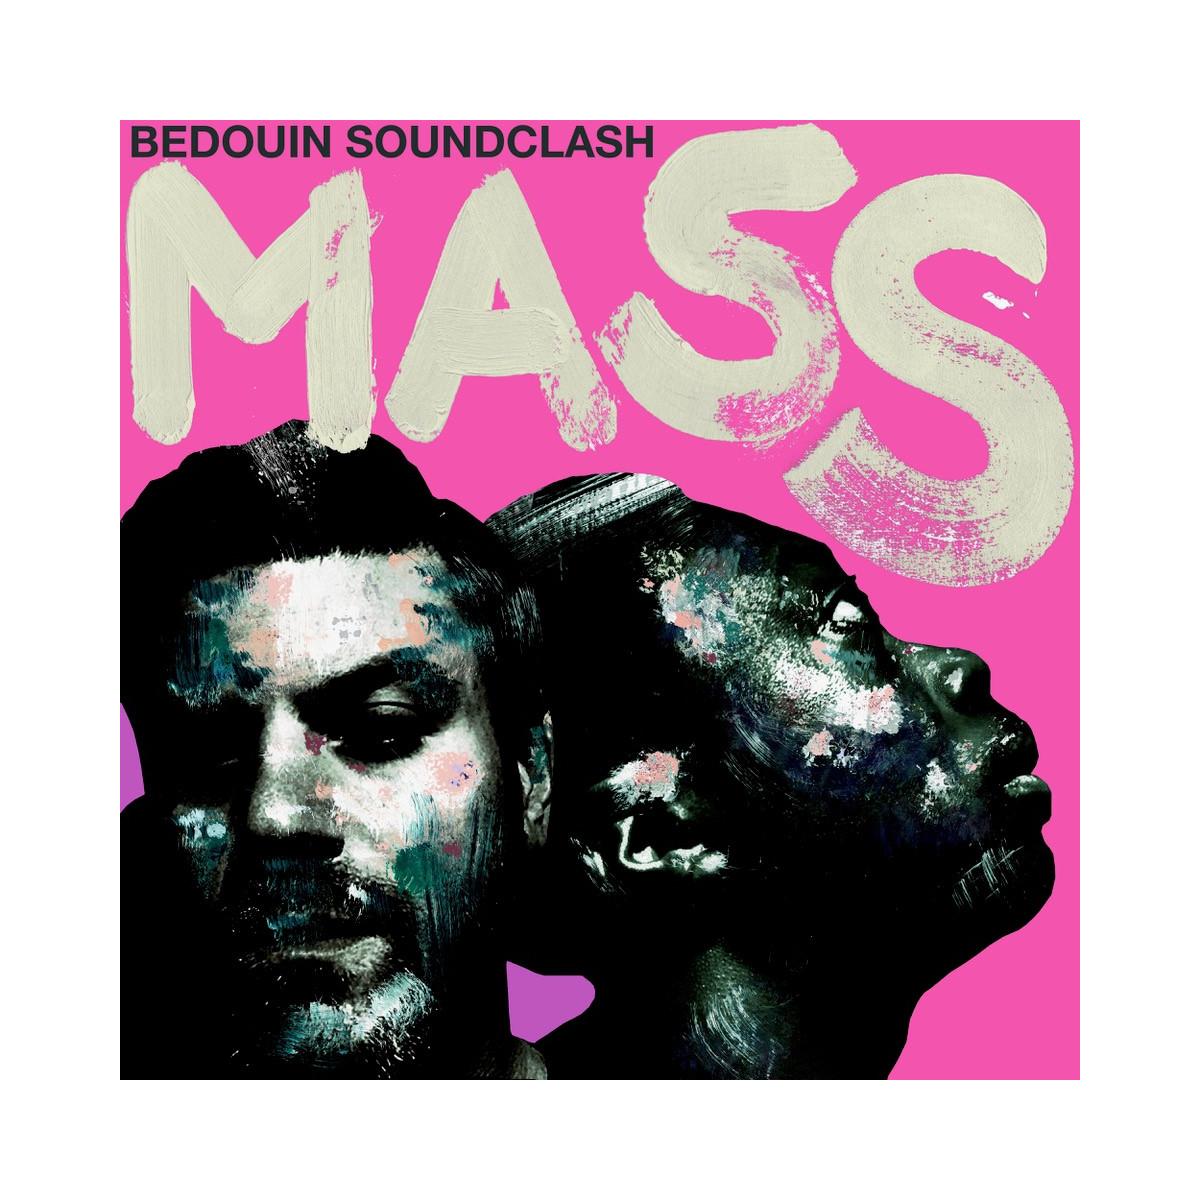 Bedouin Soundclash: Mass Digitial Download